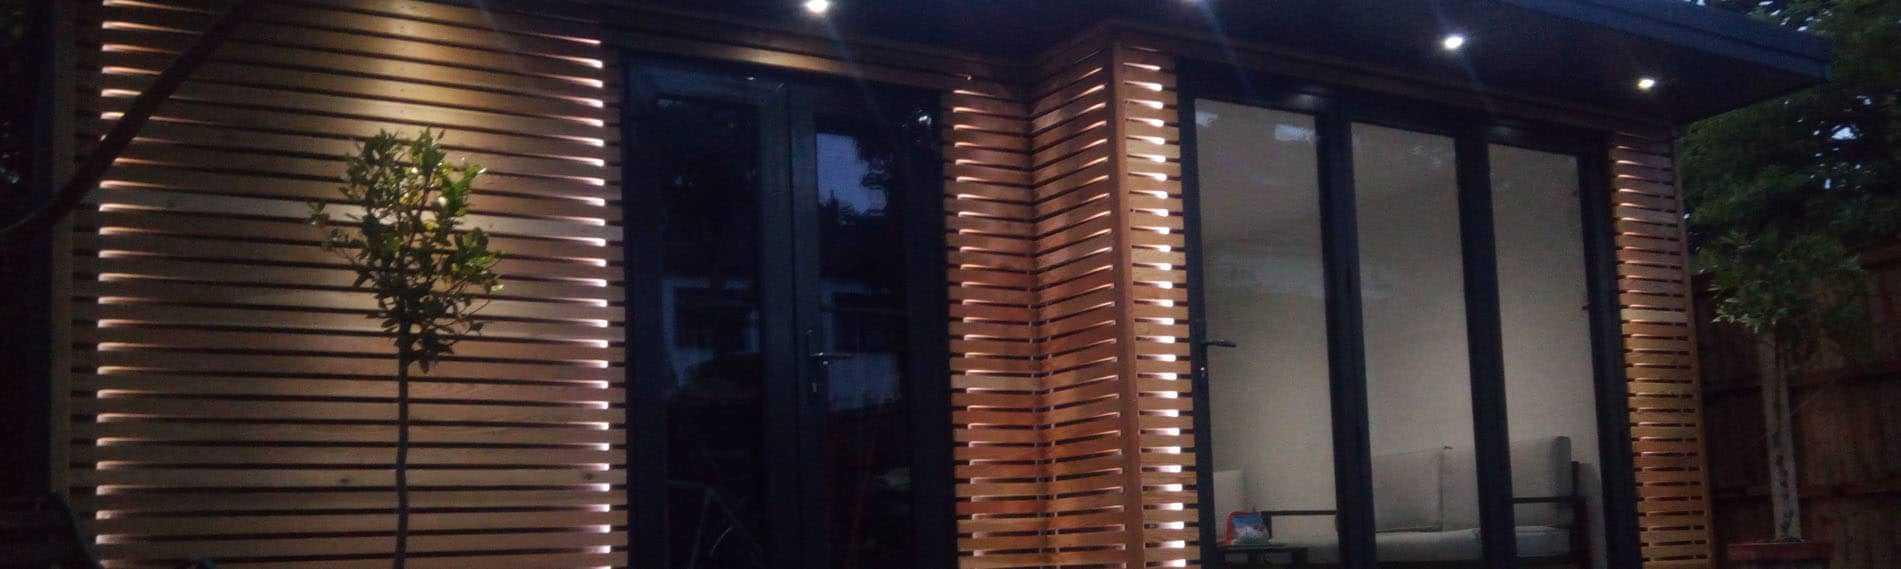 Southgate Timber